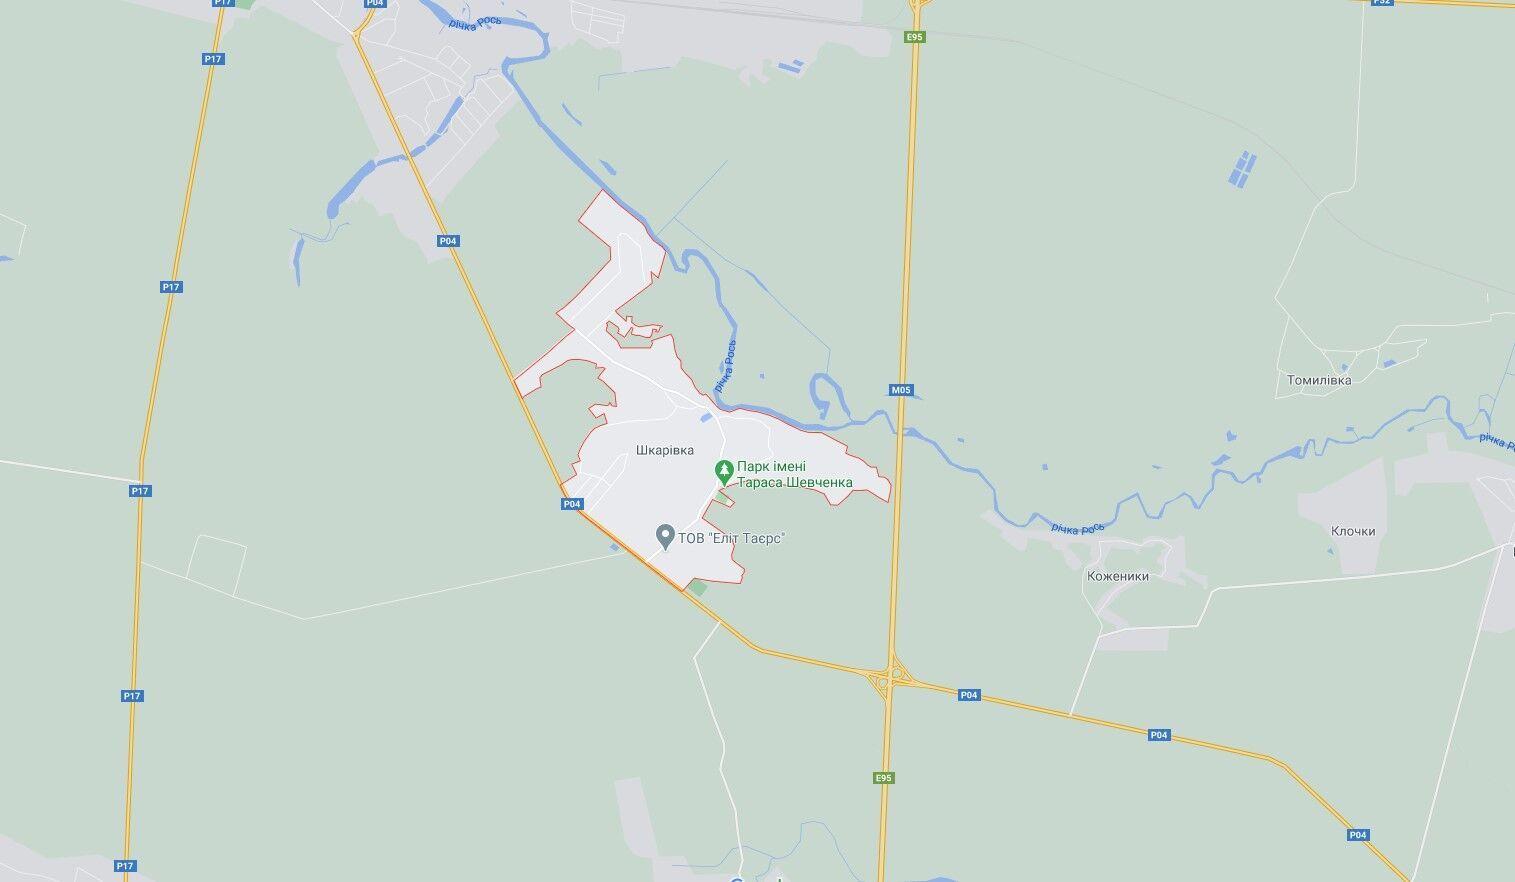 ДТП произошло на трассе Киев – Одесса.